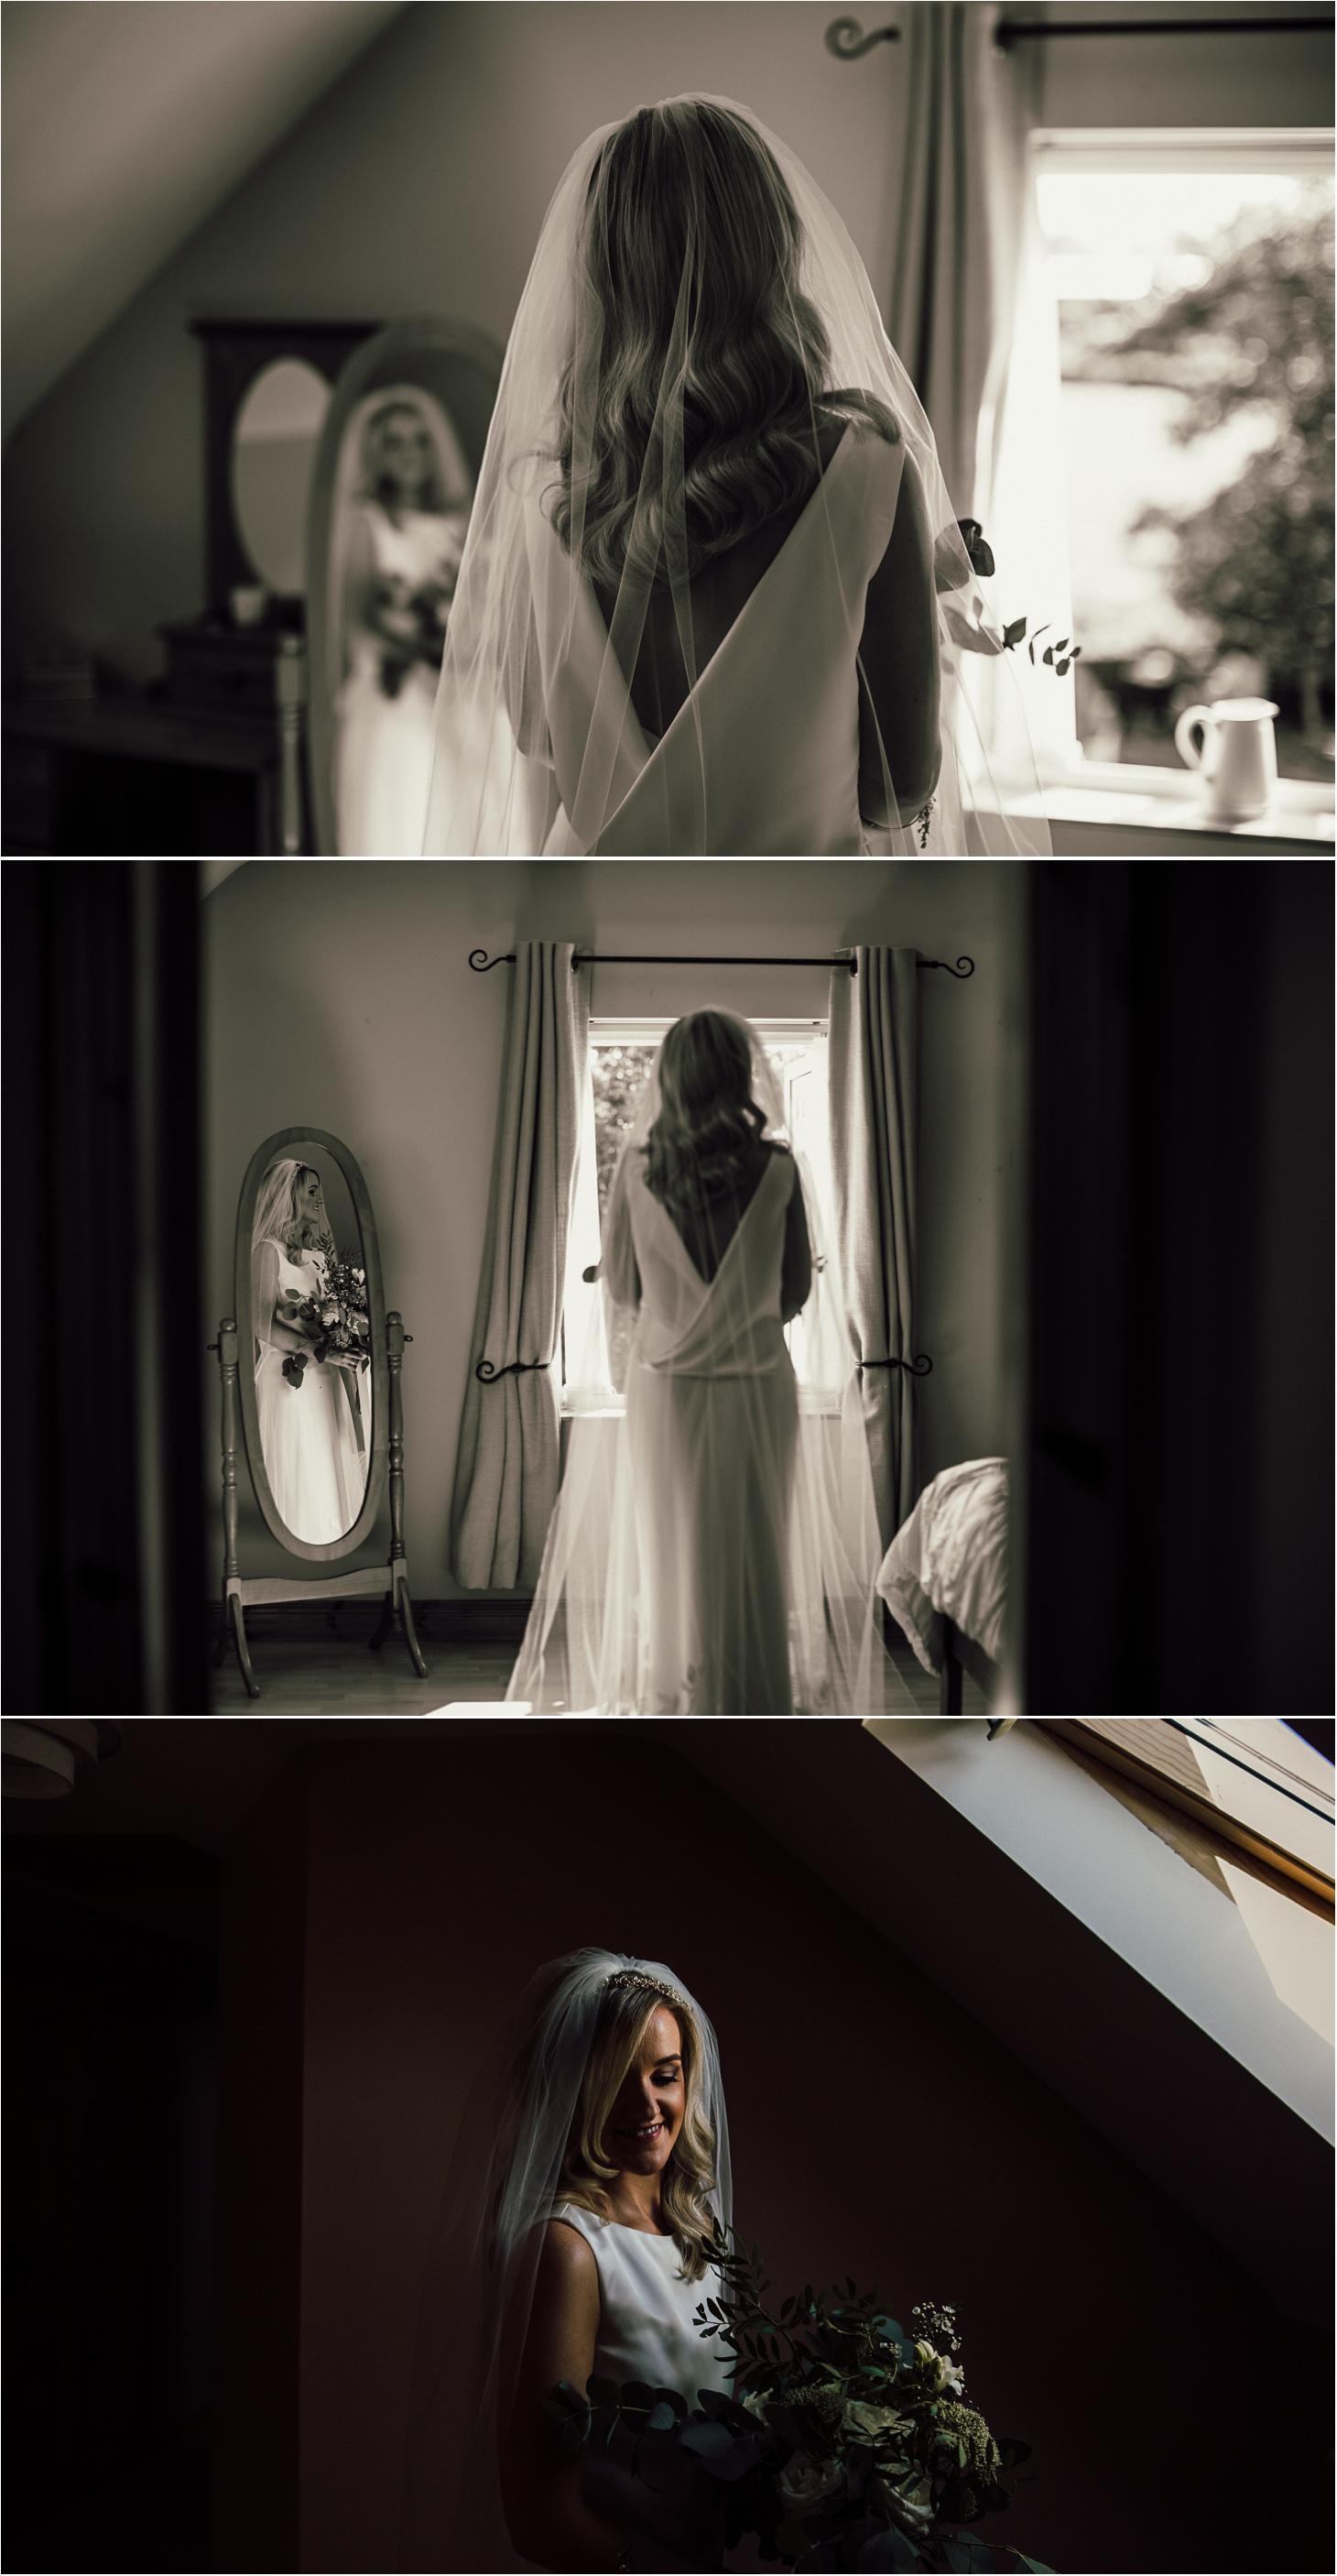 Virgina Lodge Photography. darren fitzpatrick. Wedding.4